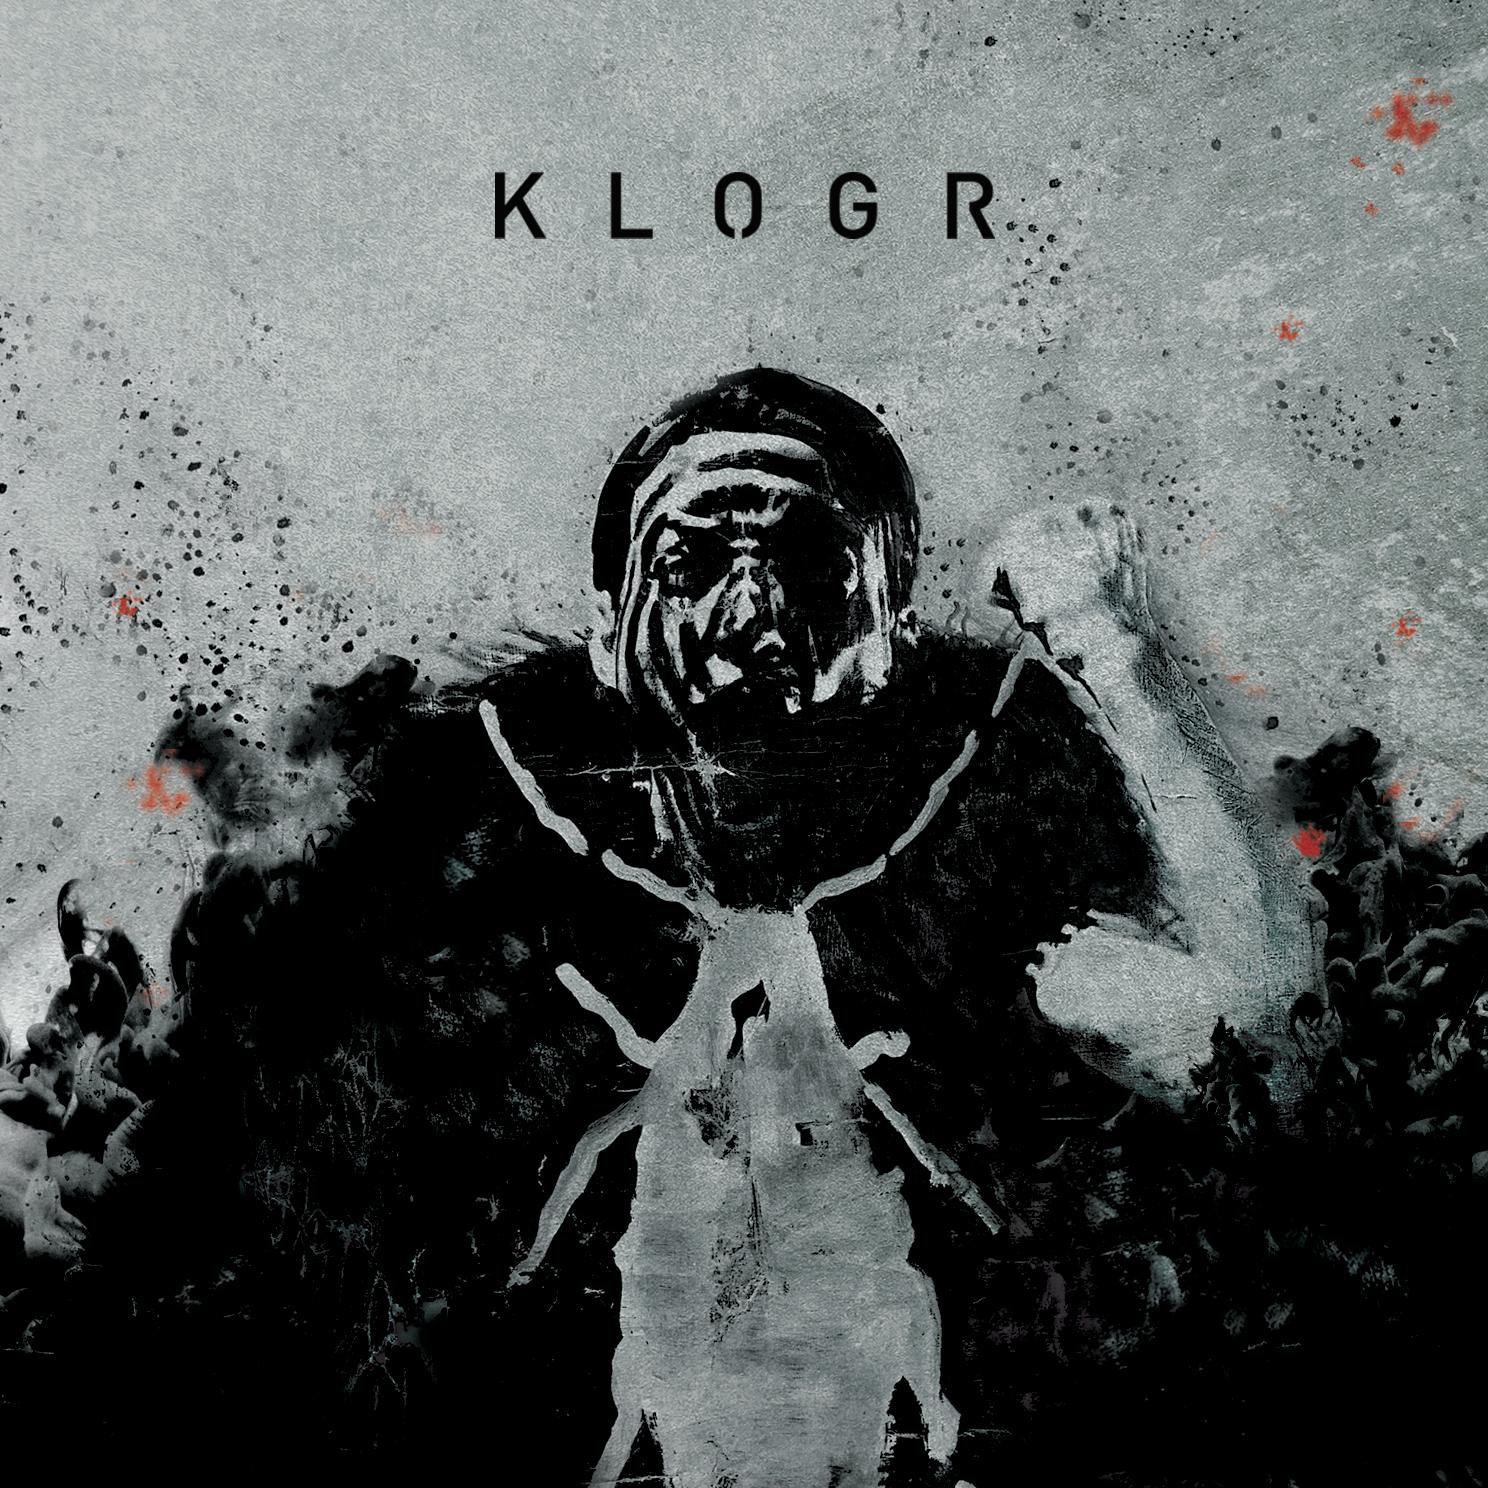 Klogr – Keystone